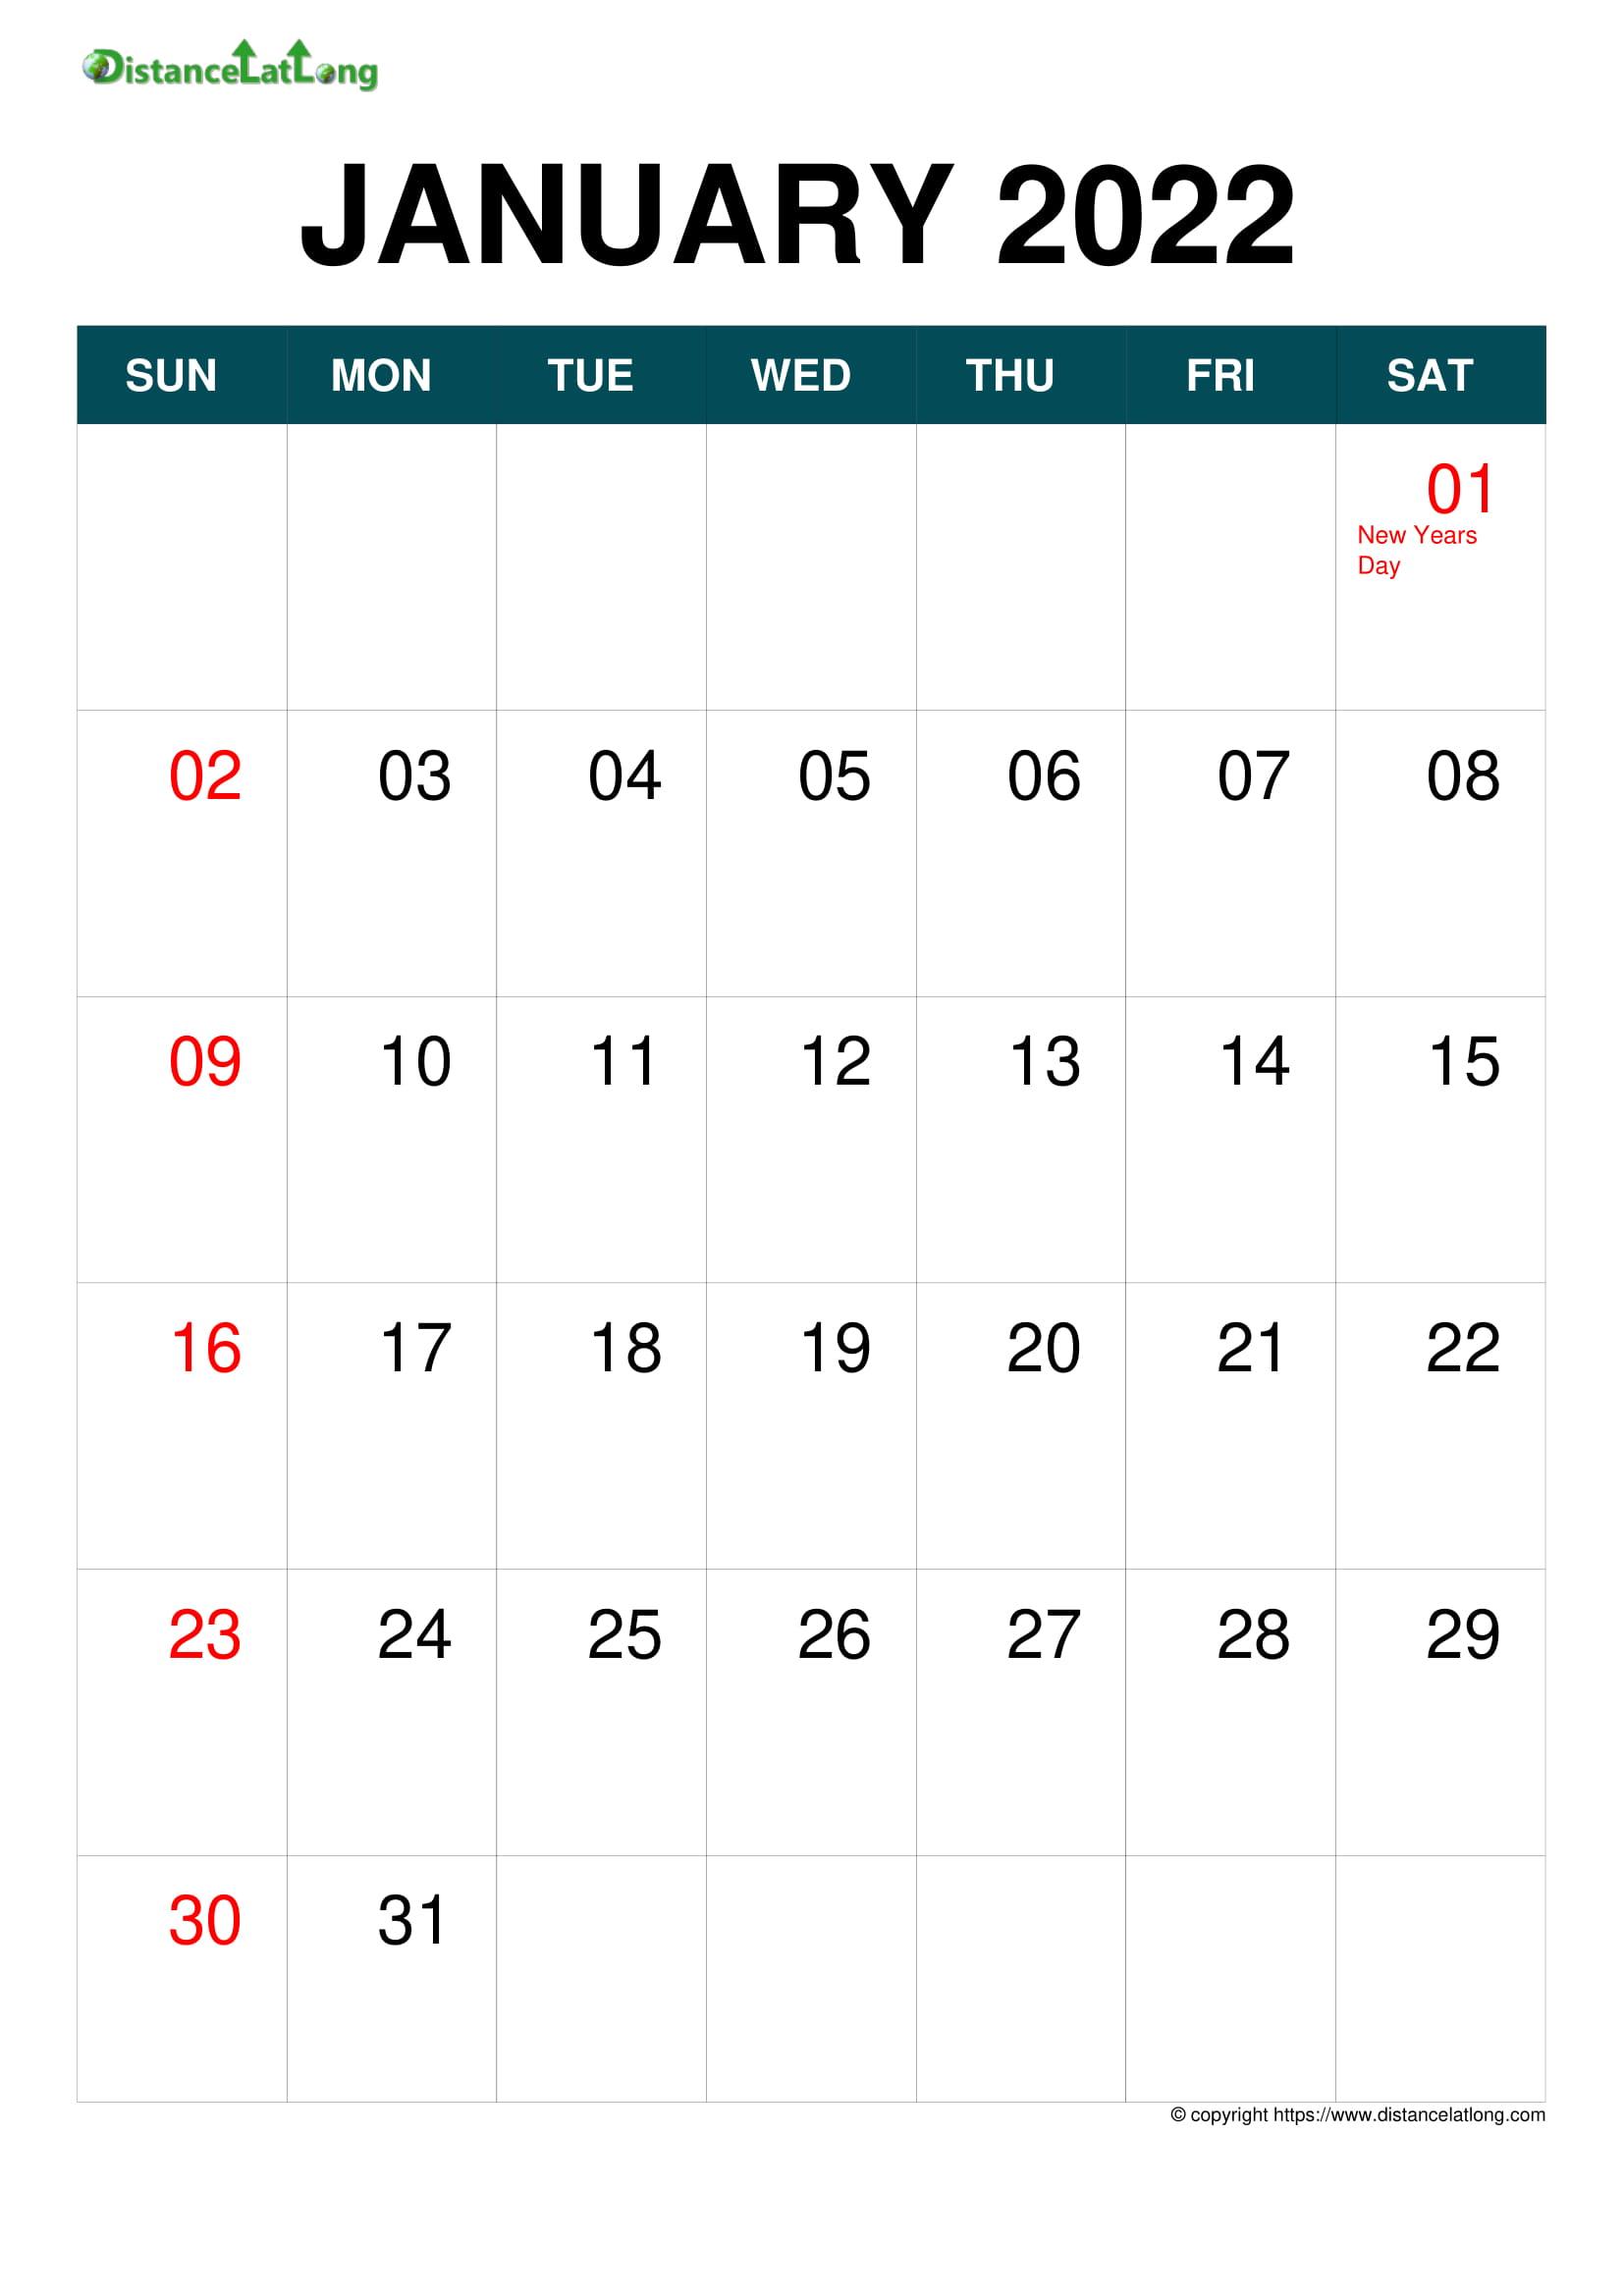 2022 Jewish Holiday Calendar.2022 Holiday Calendar Portrait Orientation Free Printable Templates Free Download Distancelatlong Com